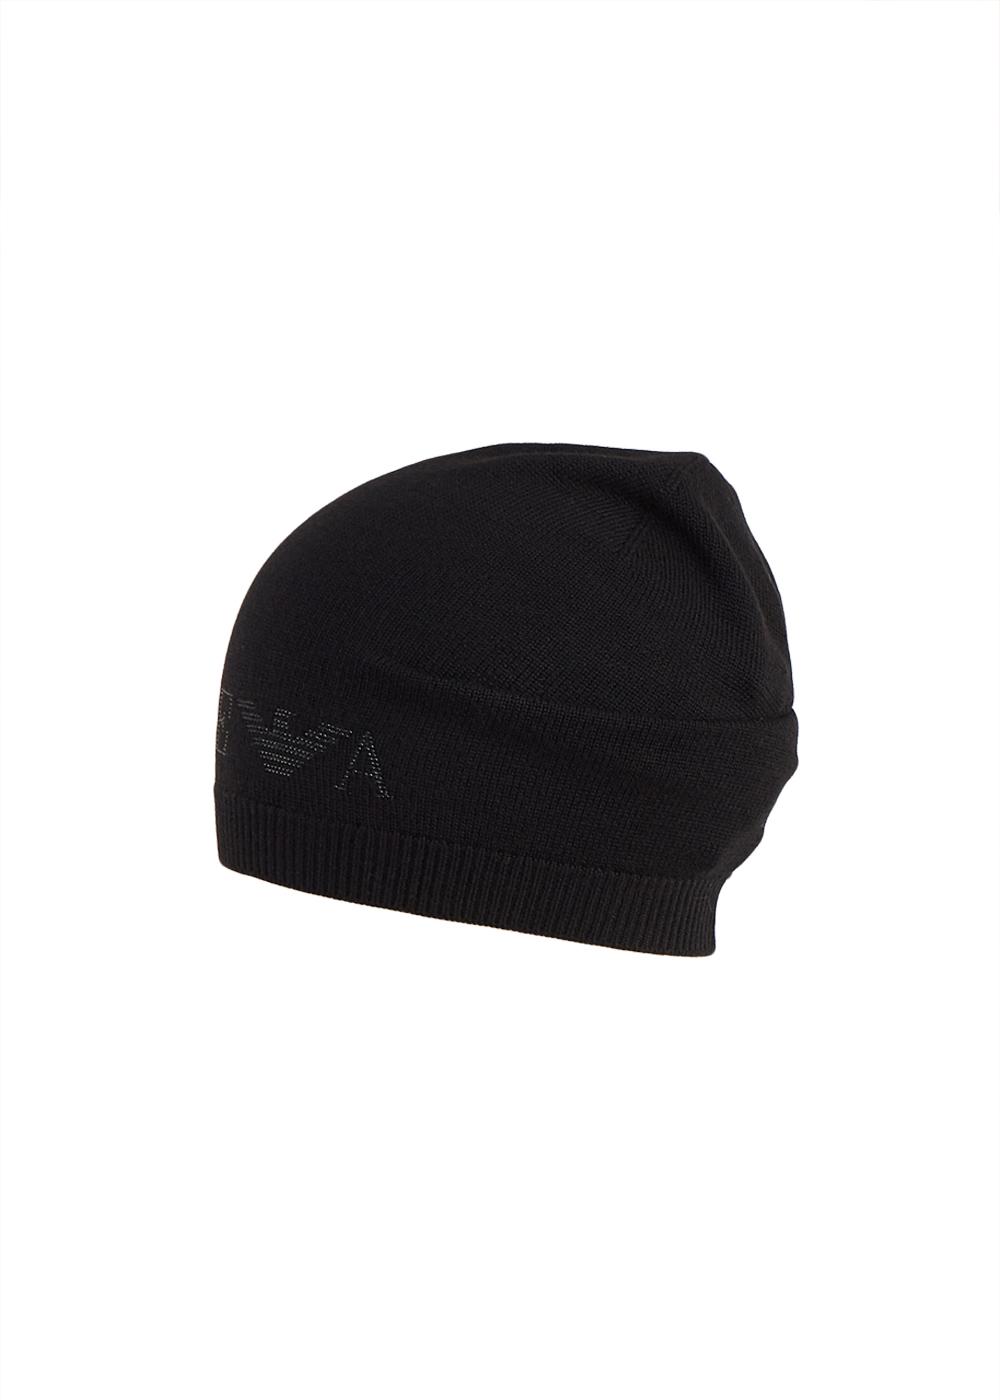 Купить Emporio Armani шапка